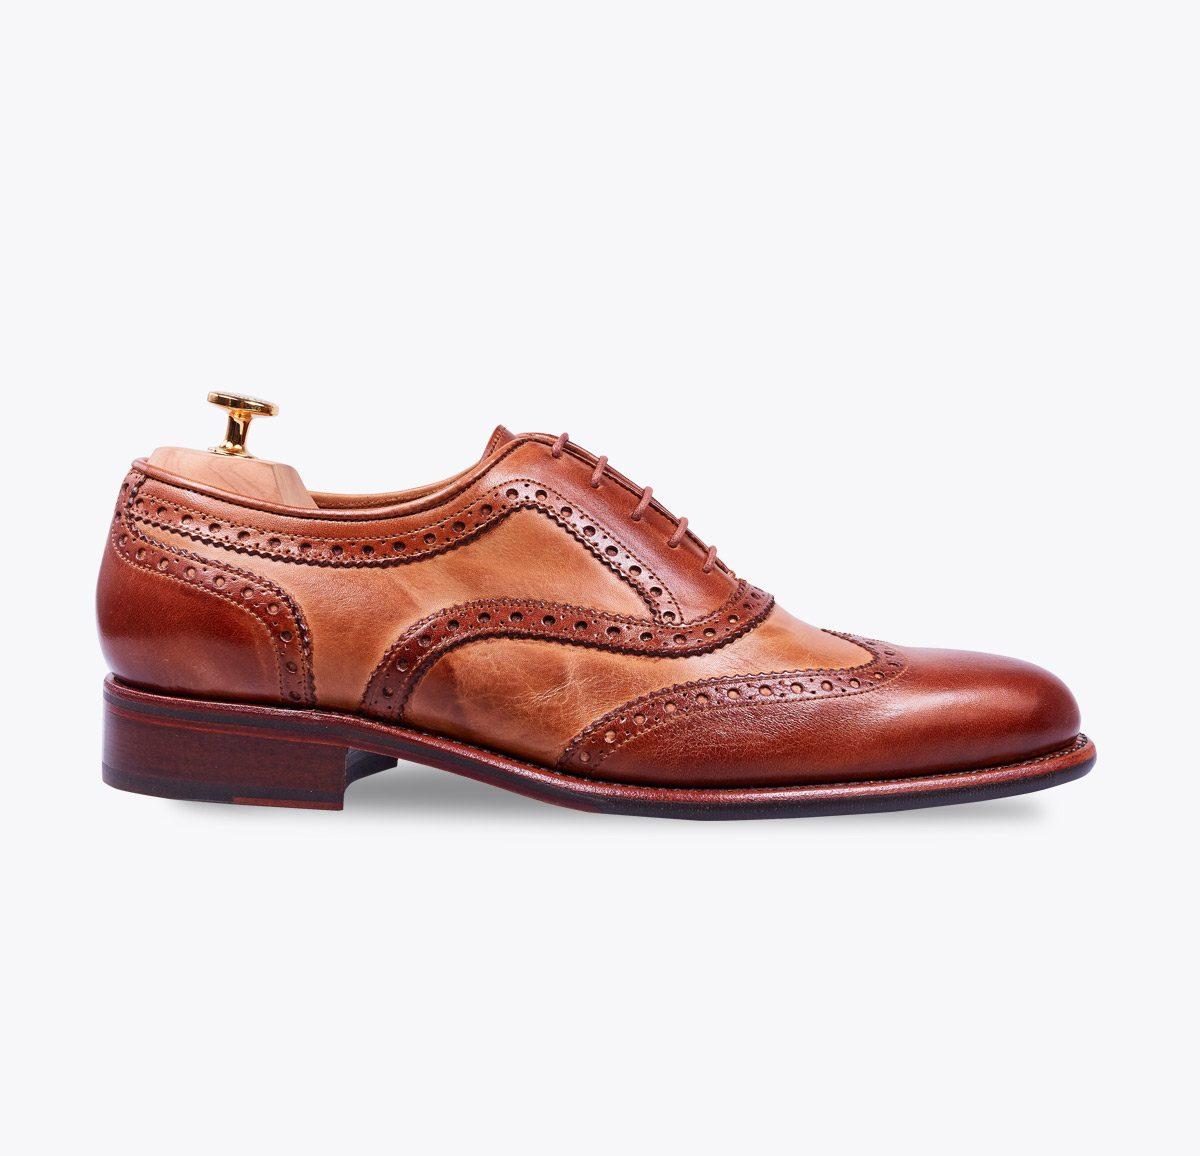 Zapato Director hecho a mano en mandalashoes, Santanyí Mallorca. Hand made shoes. Nach Mass Schuhe